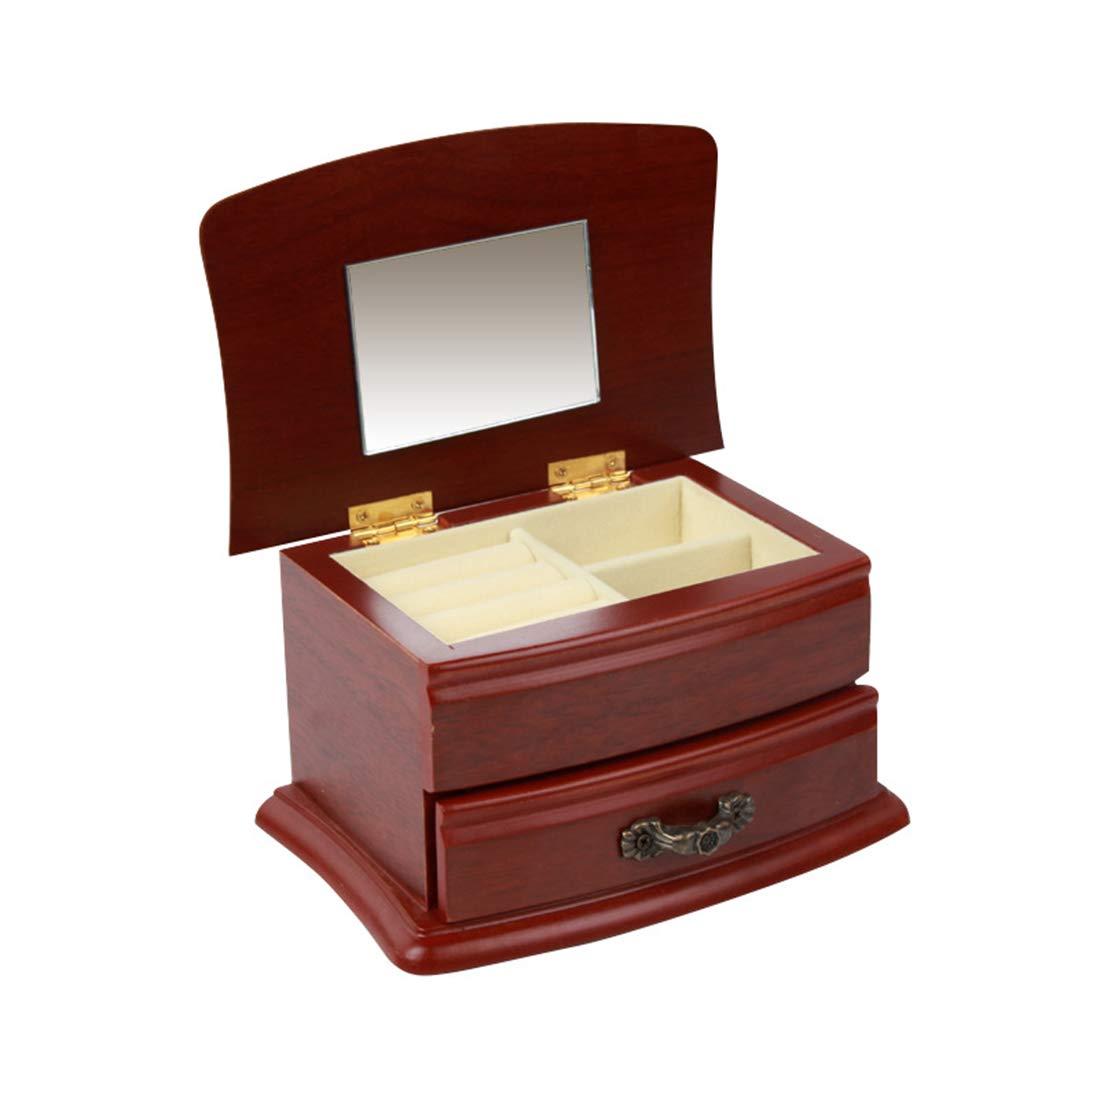 CAFUTY 多機能ソリッドウッドベルトロッククロス棺ジュエリーボックスパールボックス、古代色 (色 : Wood Brown) B07QW4KFX3 Wood Brown